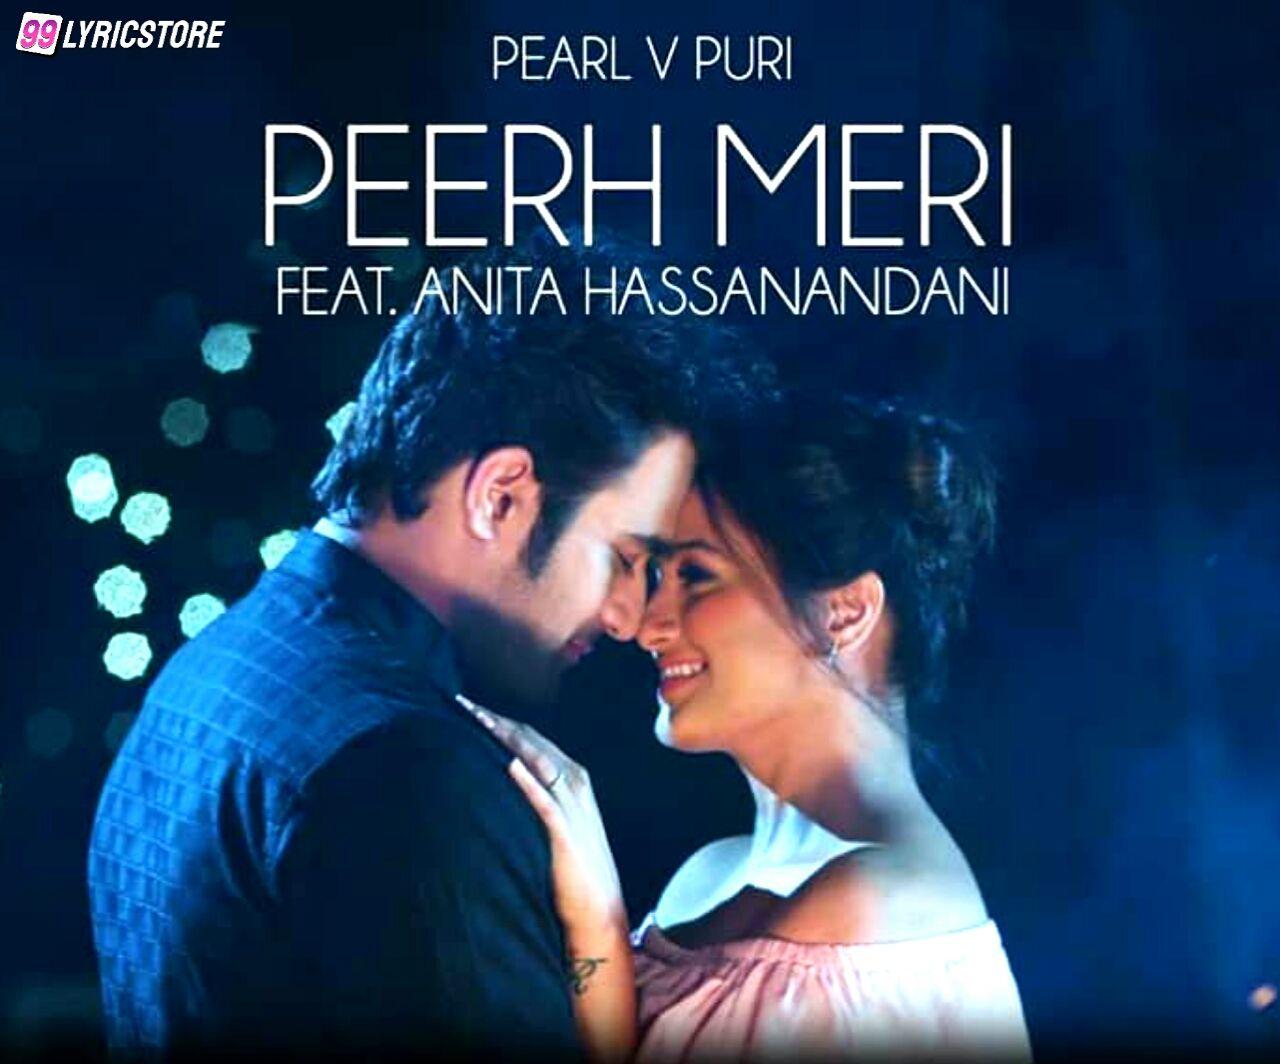 Peerh Meri punjabi song Lyrics Sung by Pearl V Puri Feat. Anita Hassanandani